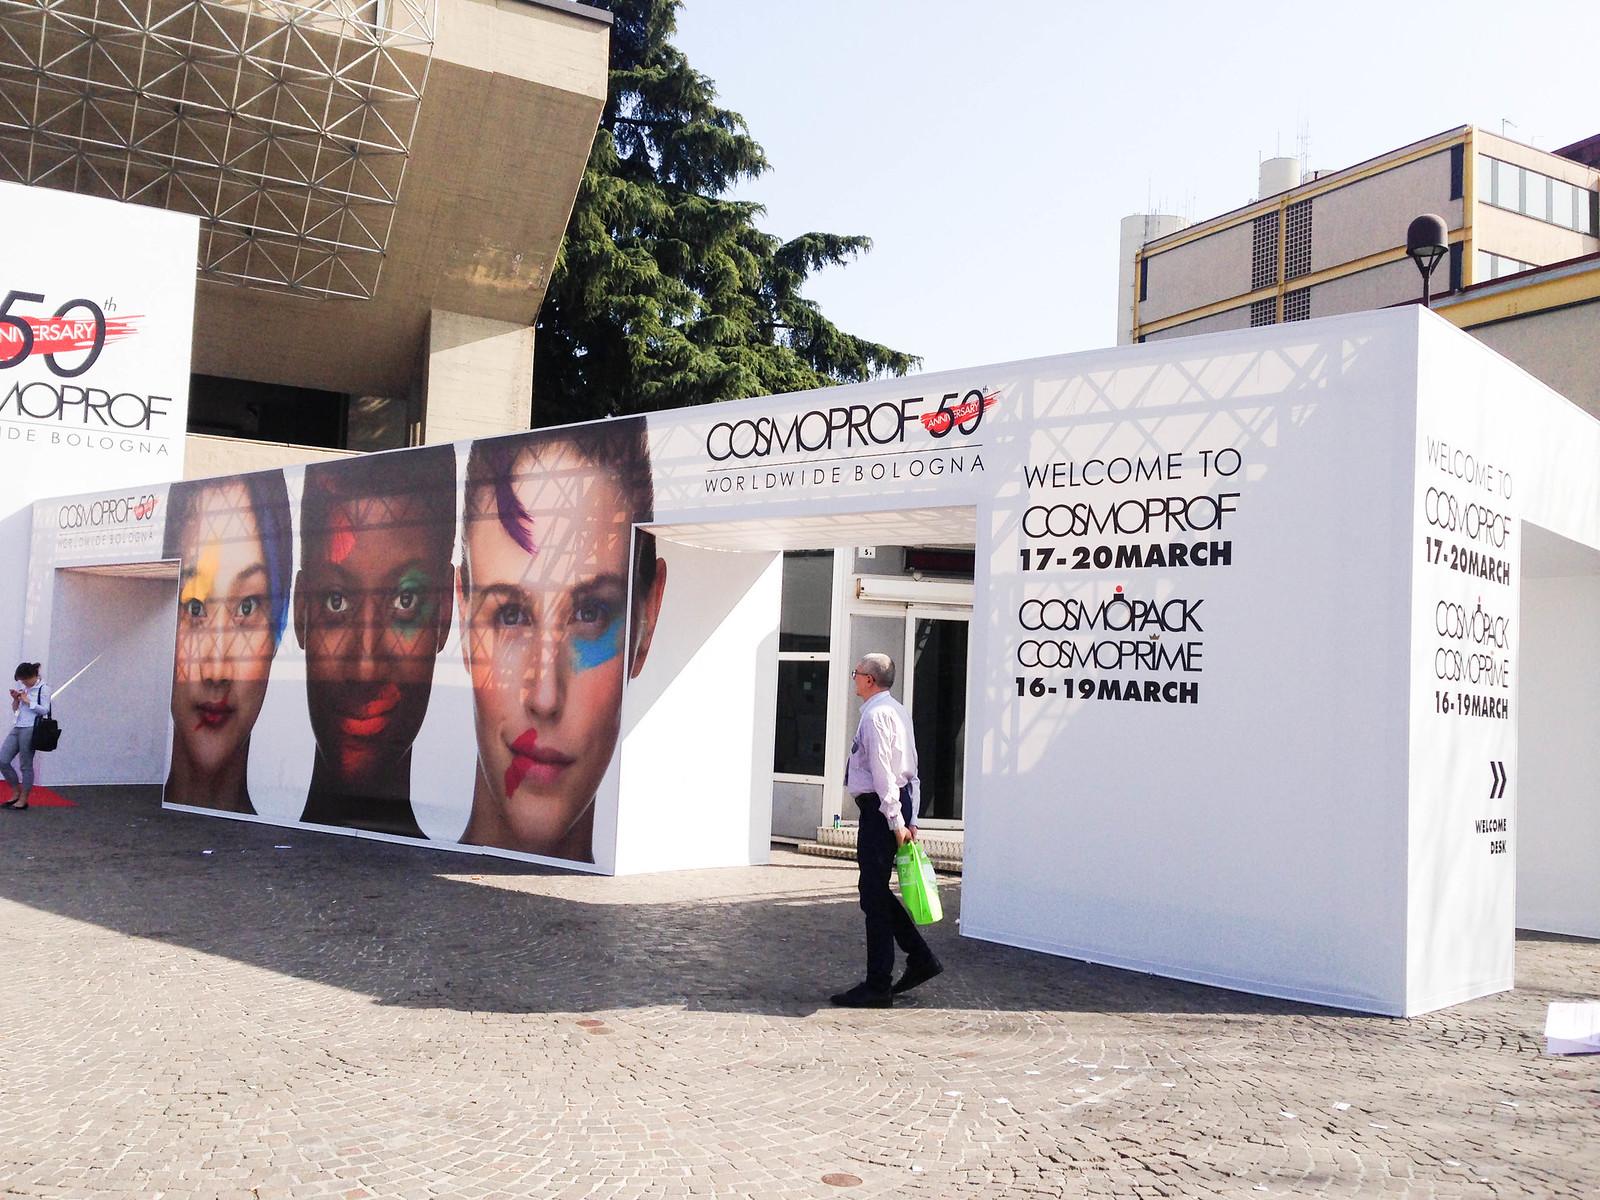 Cosmoprof Worldwide Bologna 2017